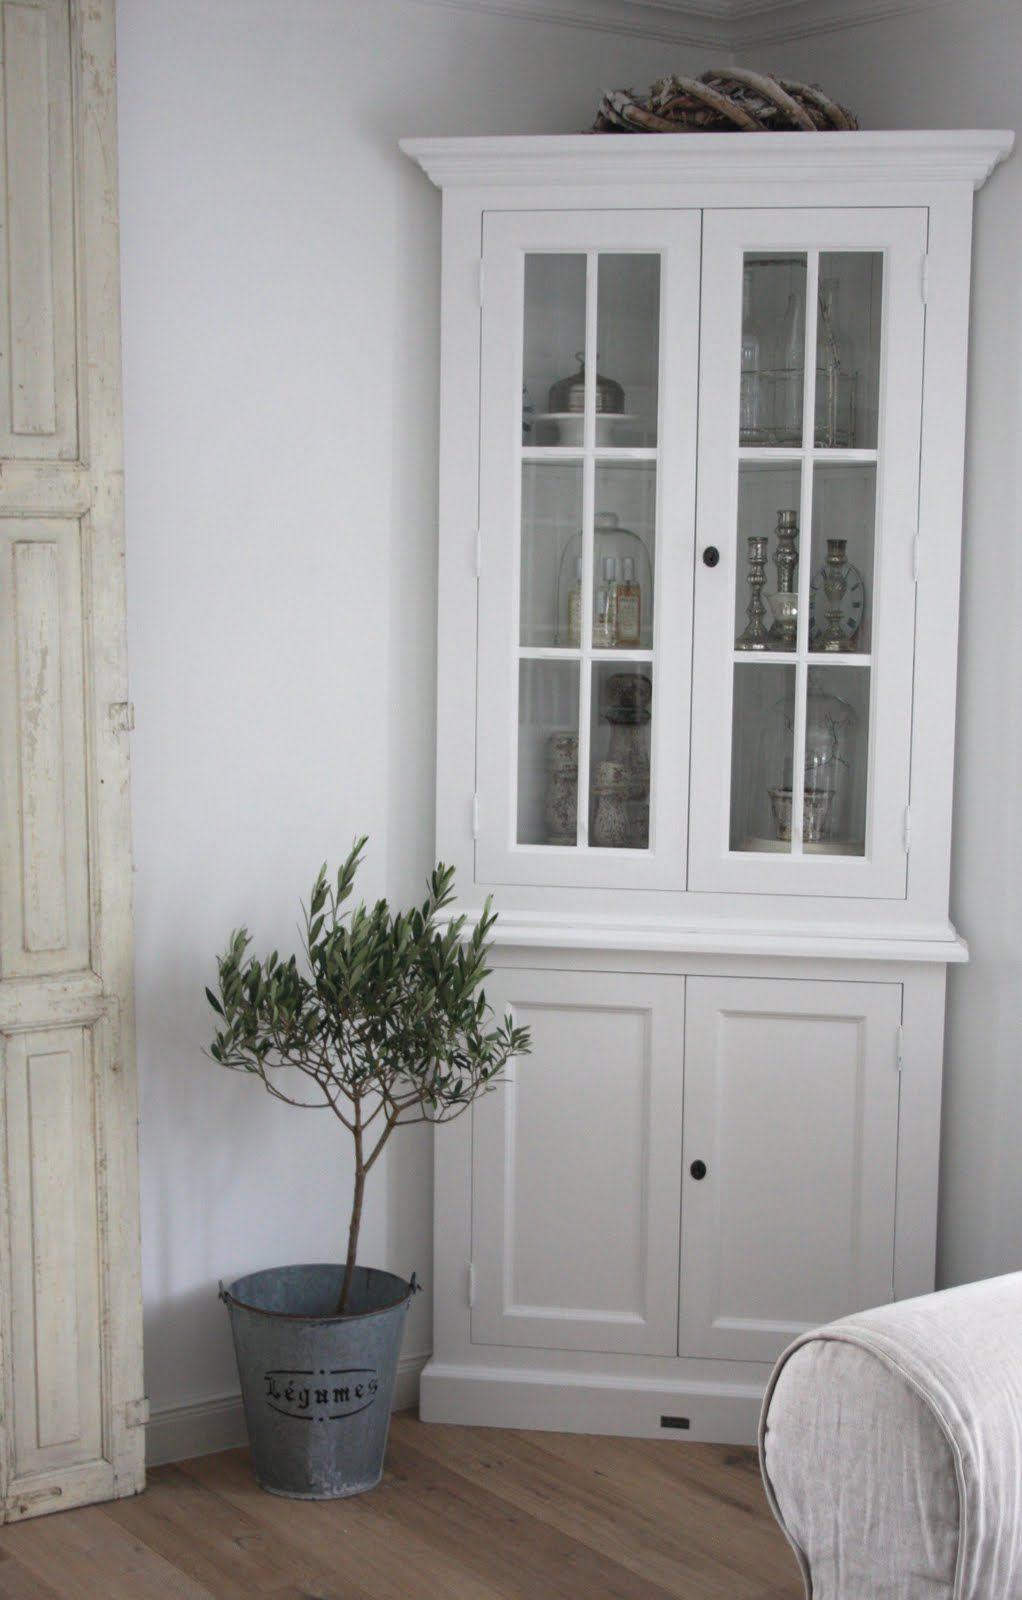 Shabby Homestyles: Corner Cabinet | Interior decor | Pinterest ...